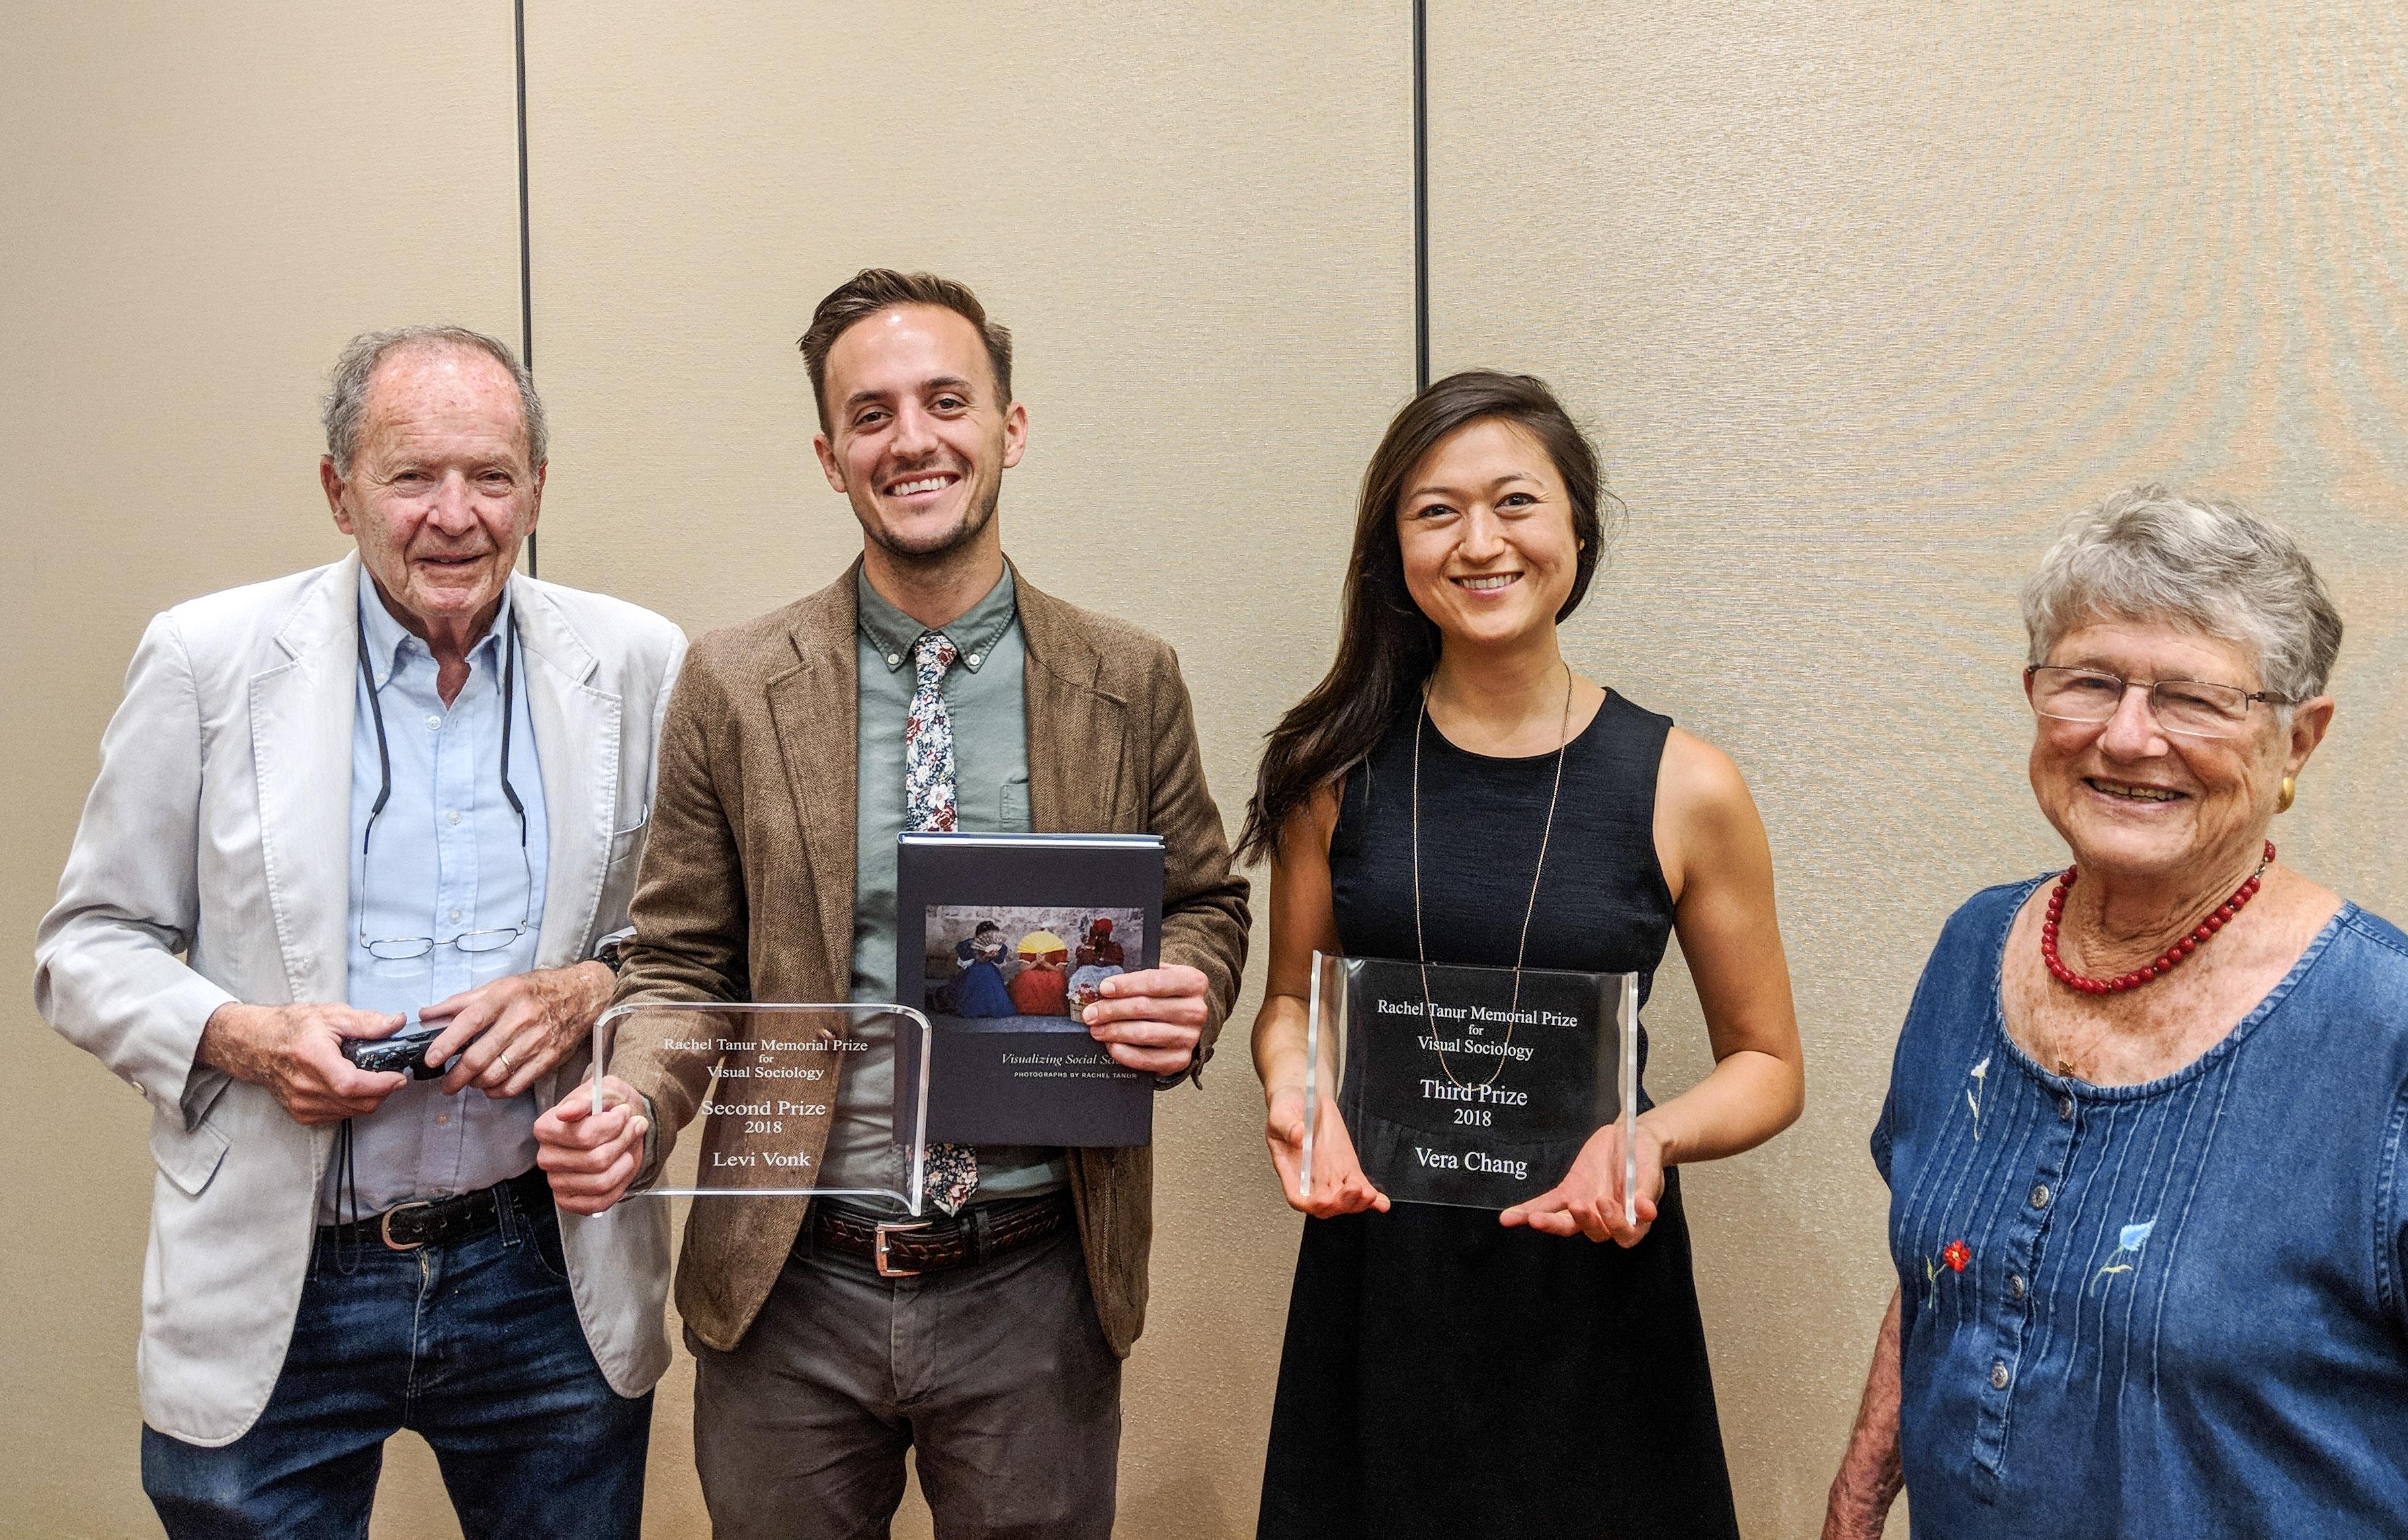 Rachel Tanur award winners